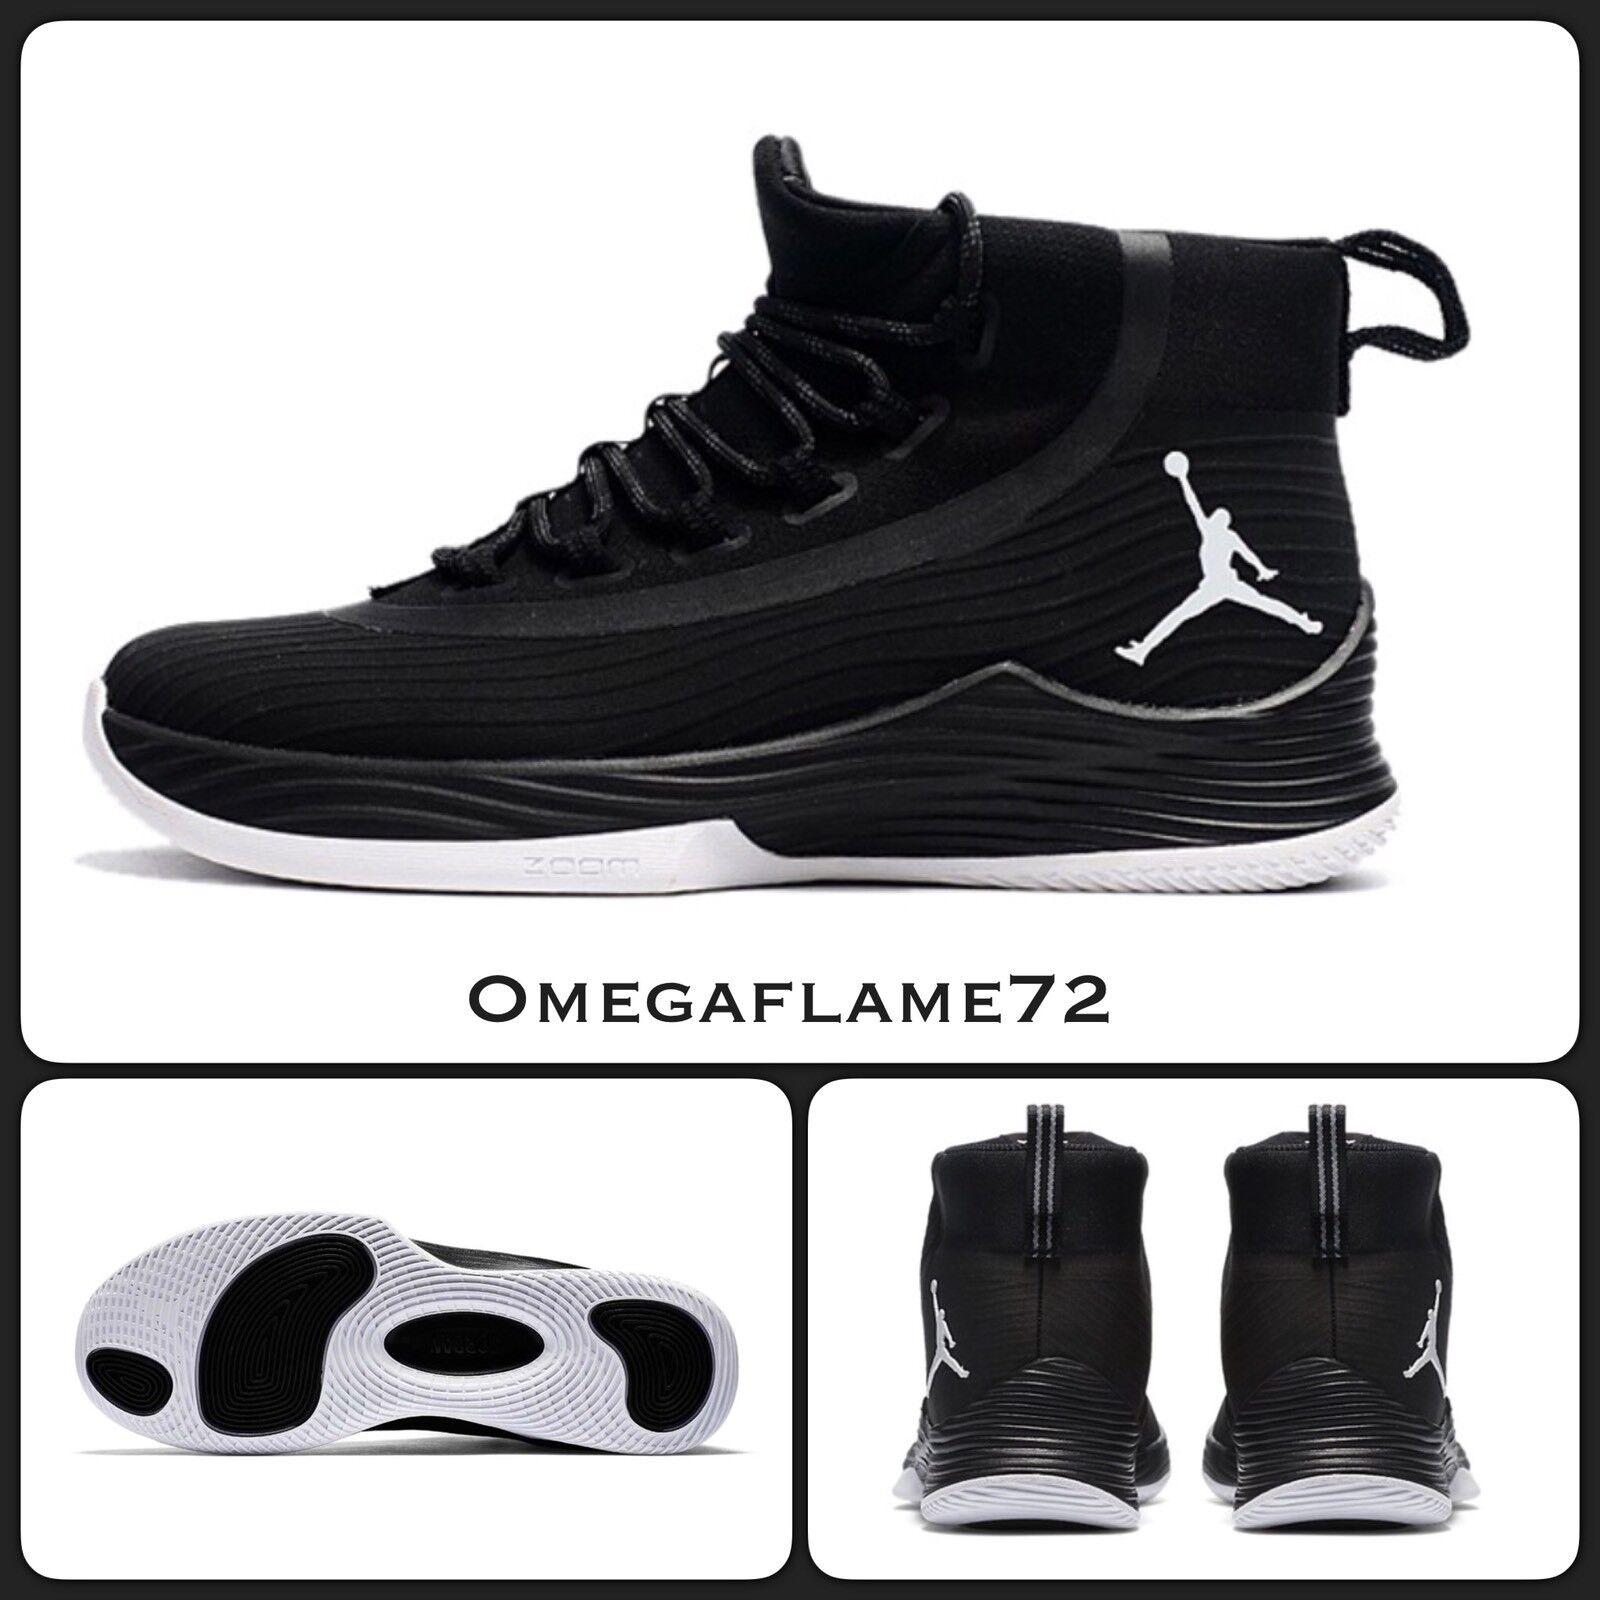 Nike Air Jordan Ultra Fly 2 897998-010, US 8.5, Black& White